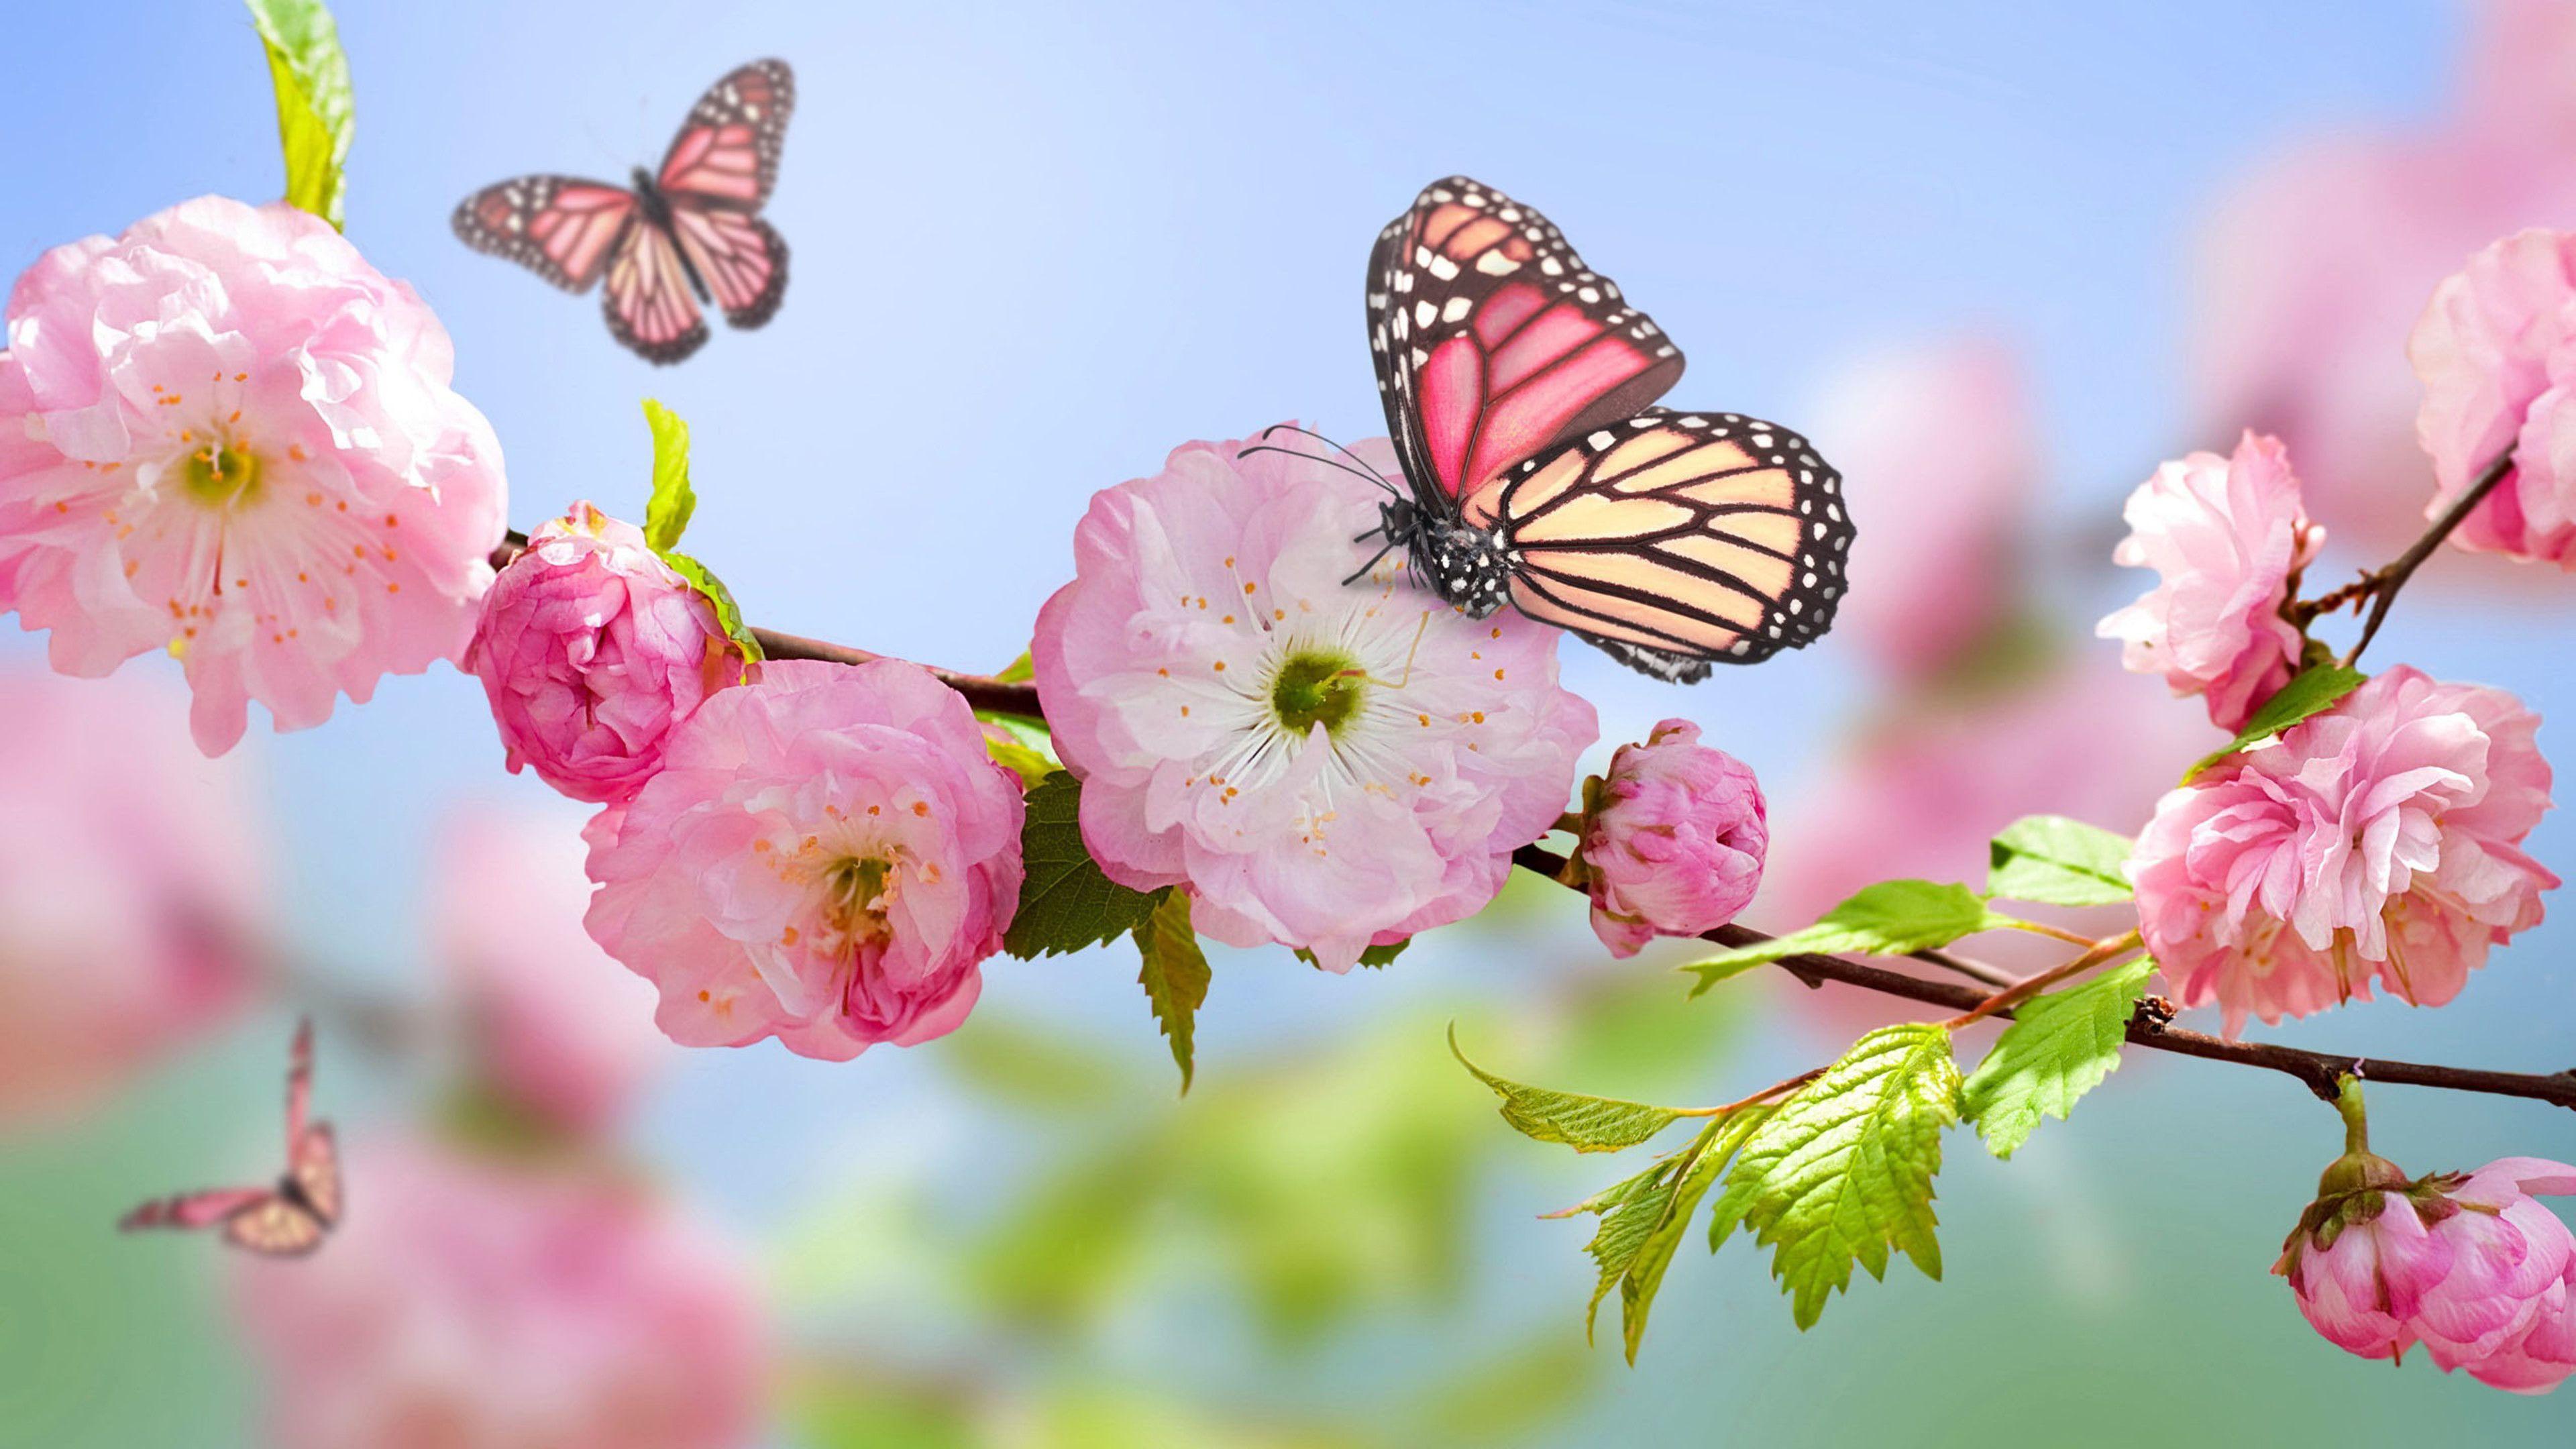 Pink Butterfly Desktop Wallpapers Top Free Pink Butterfly Desktop Backgrounds Wallpaperaccess